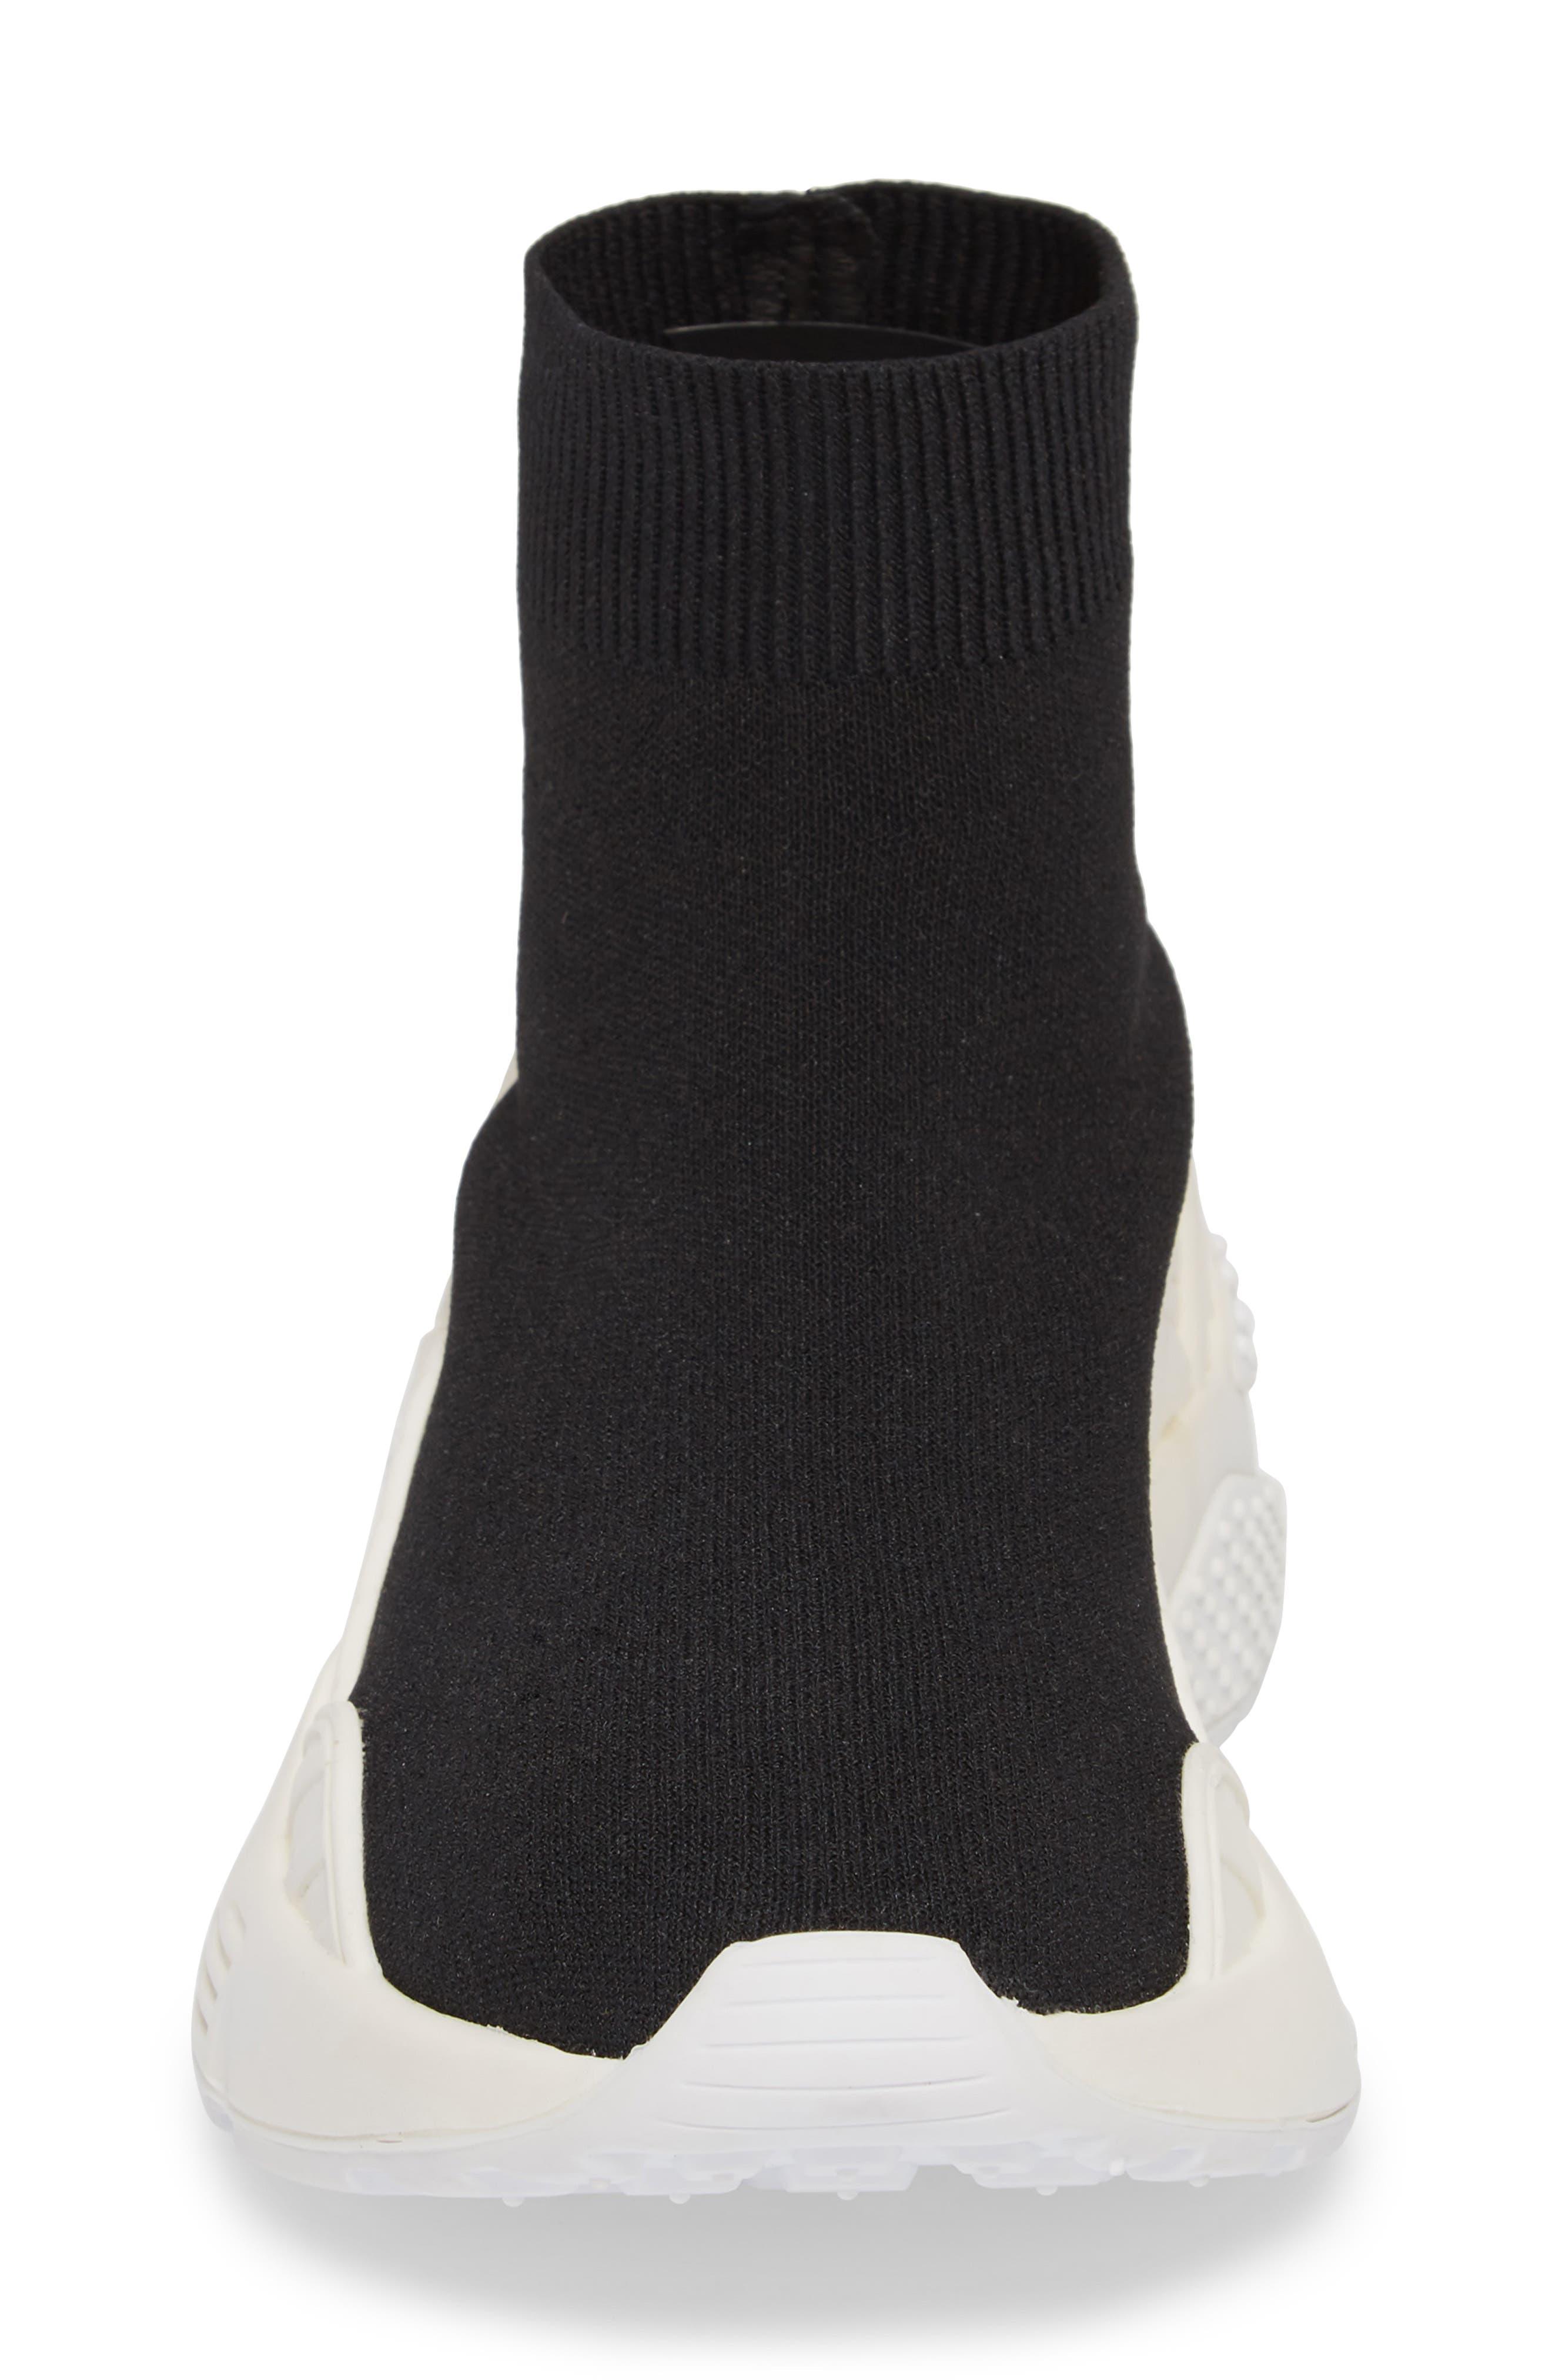 Lunix Sock Sneaker,                             Alternate thumbnail 4, color,                             Black/ White Leather